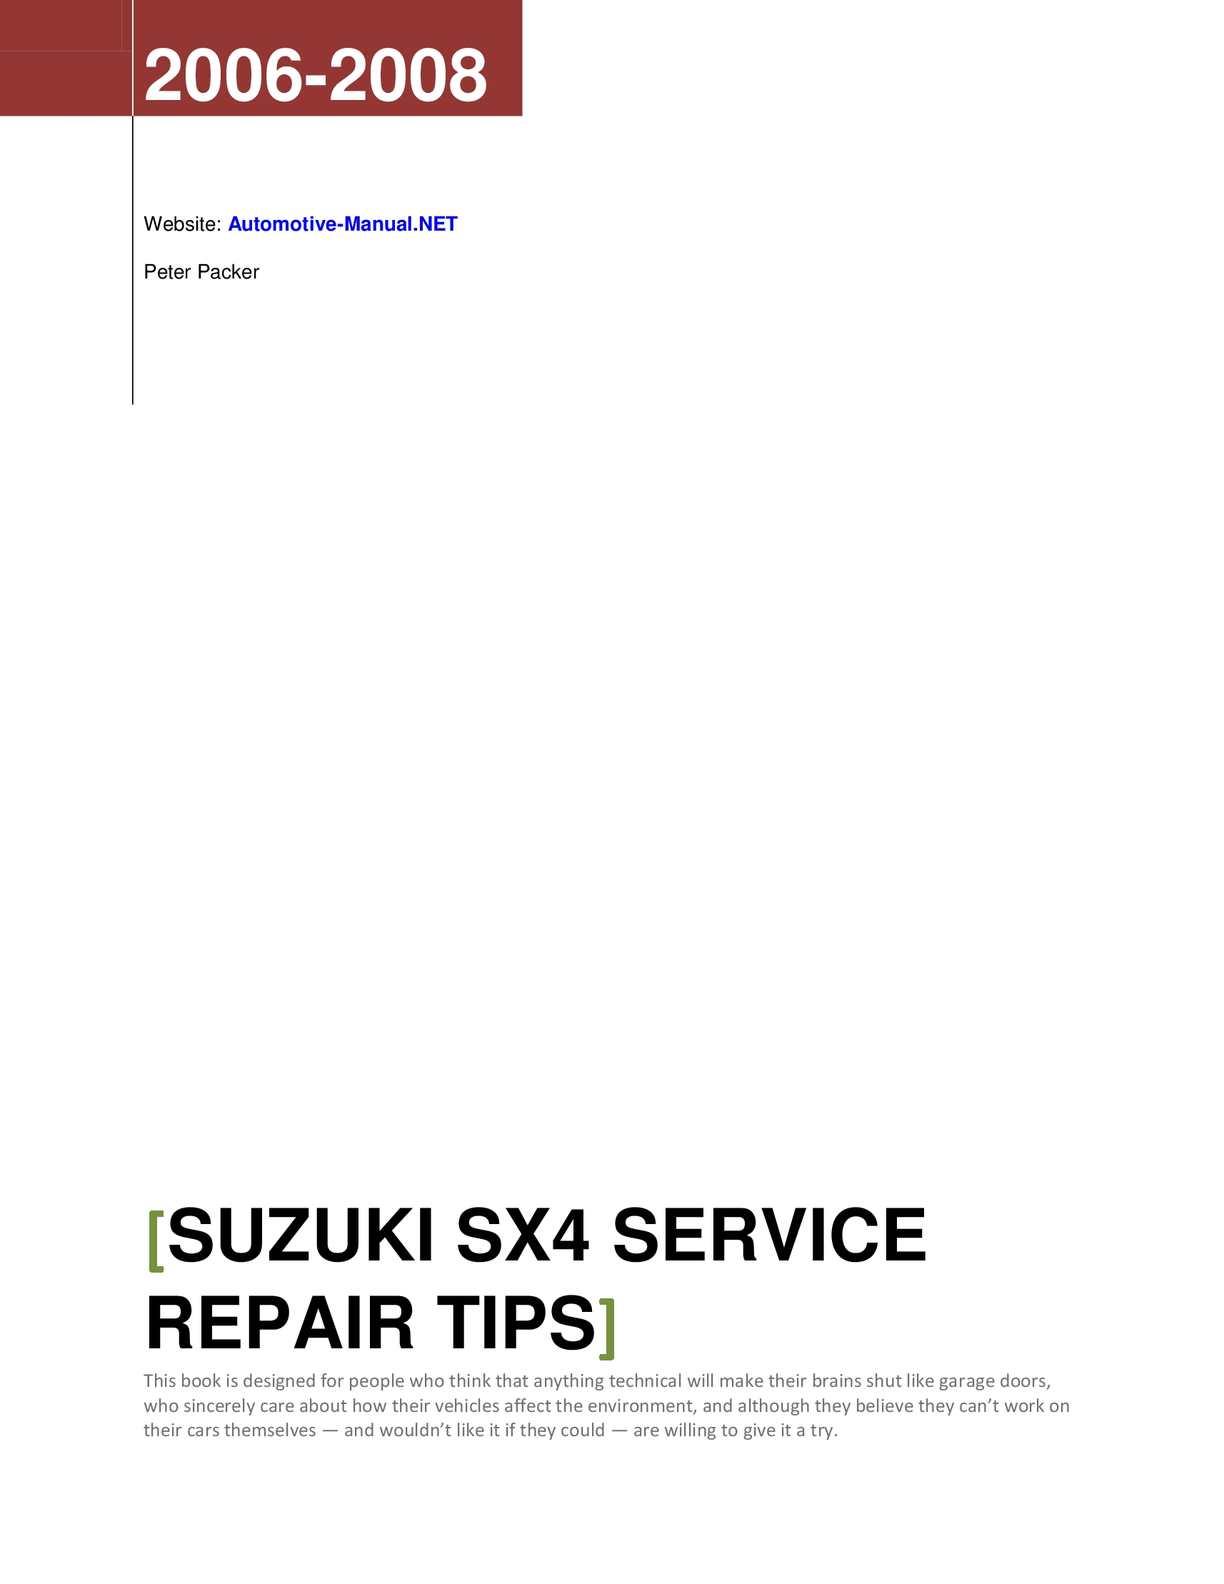 hight resolution of suzuki sx4 2006 2008 service repair tips